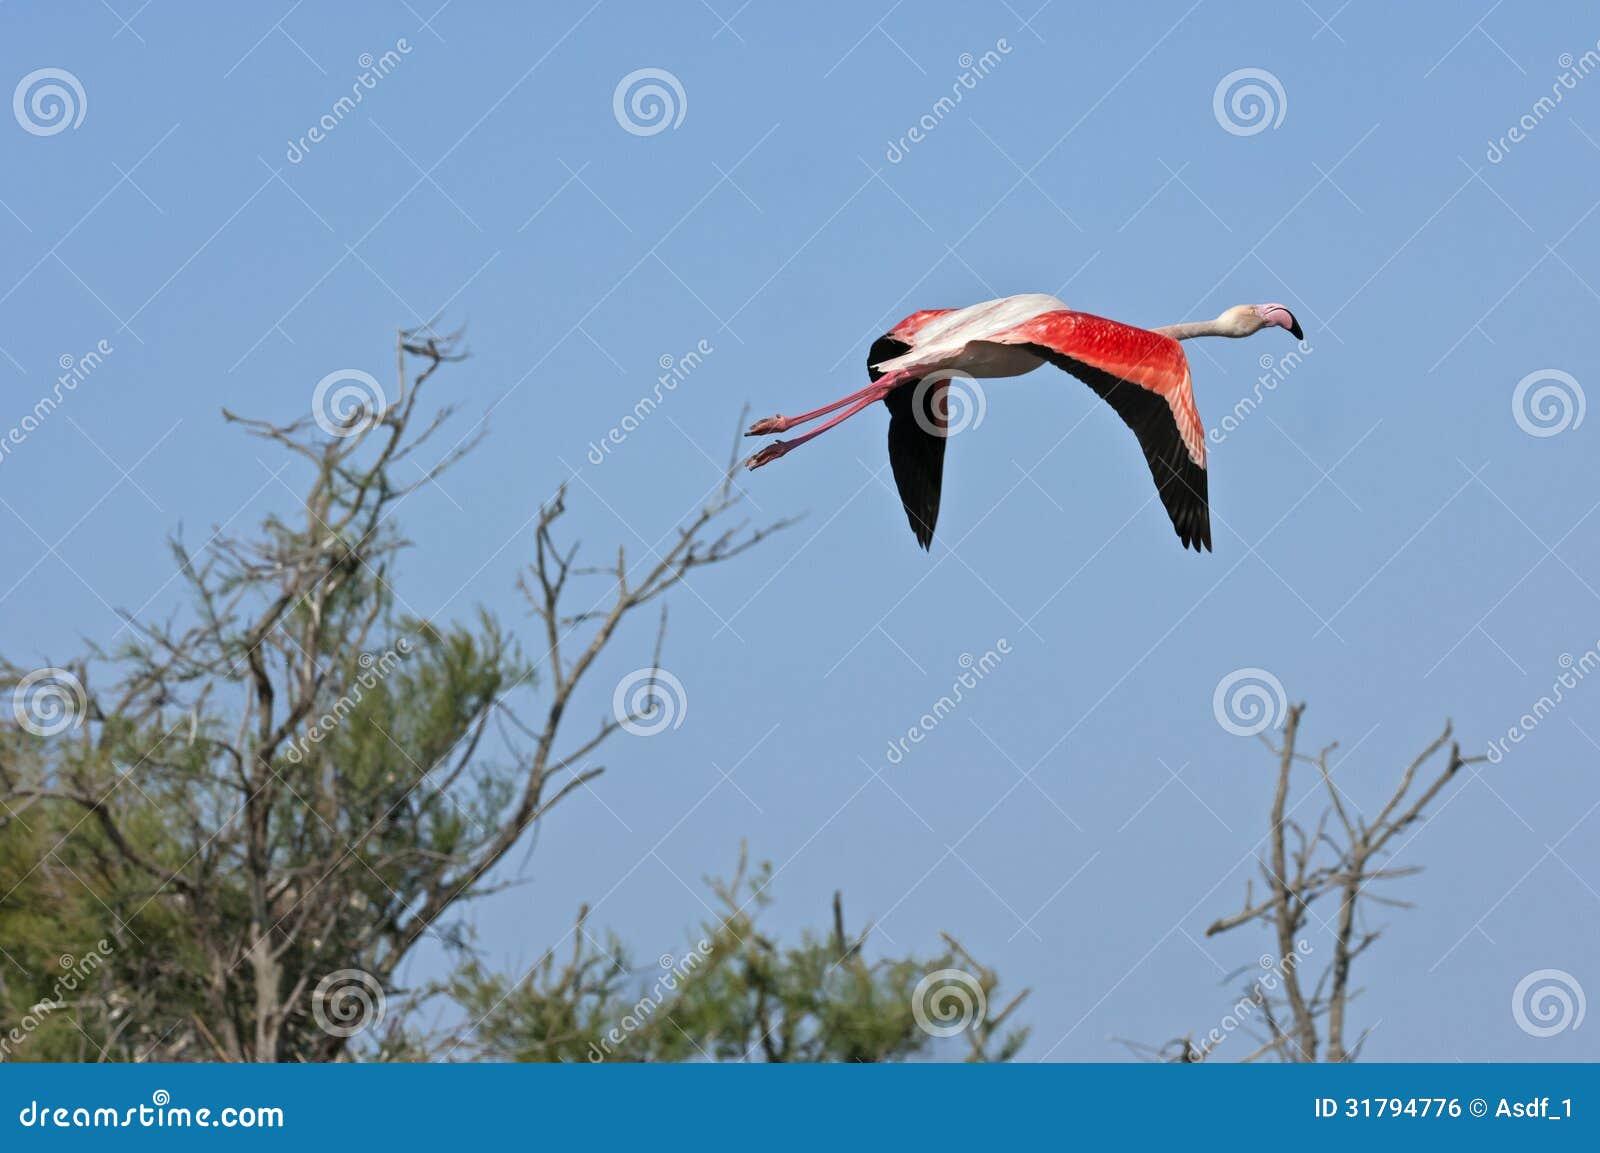 Aninimal Book: Greater Flamingo Royalty Free Stock Image - Image: 31794776